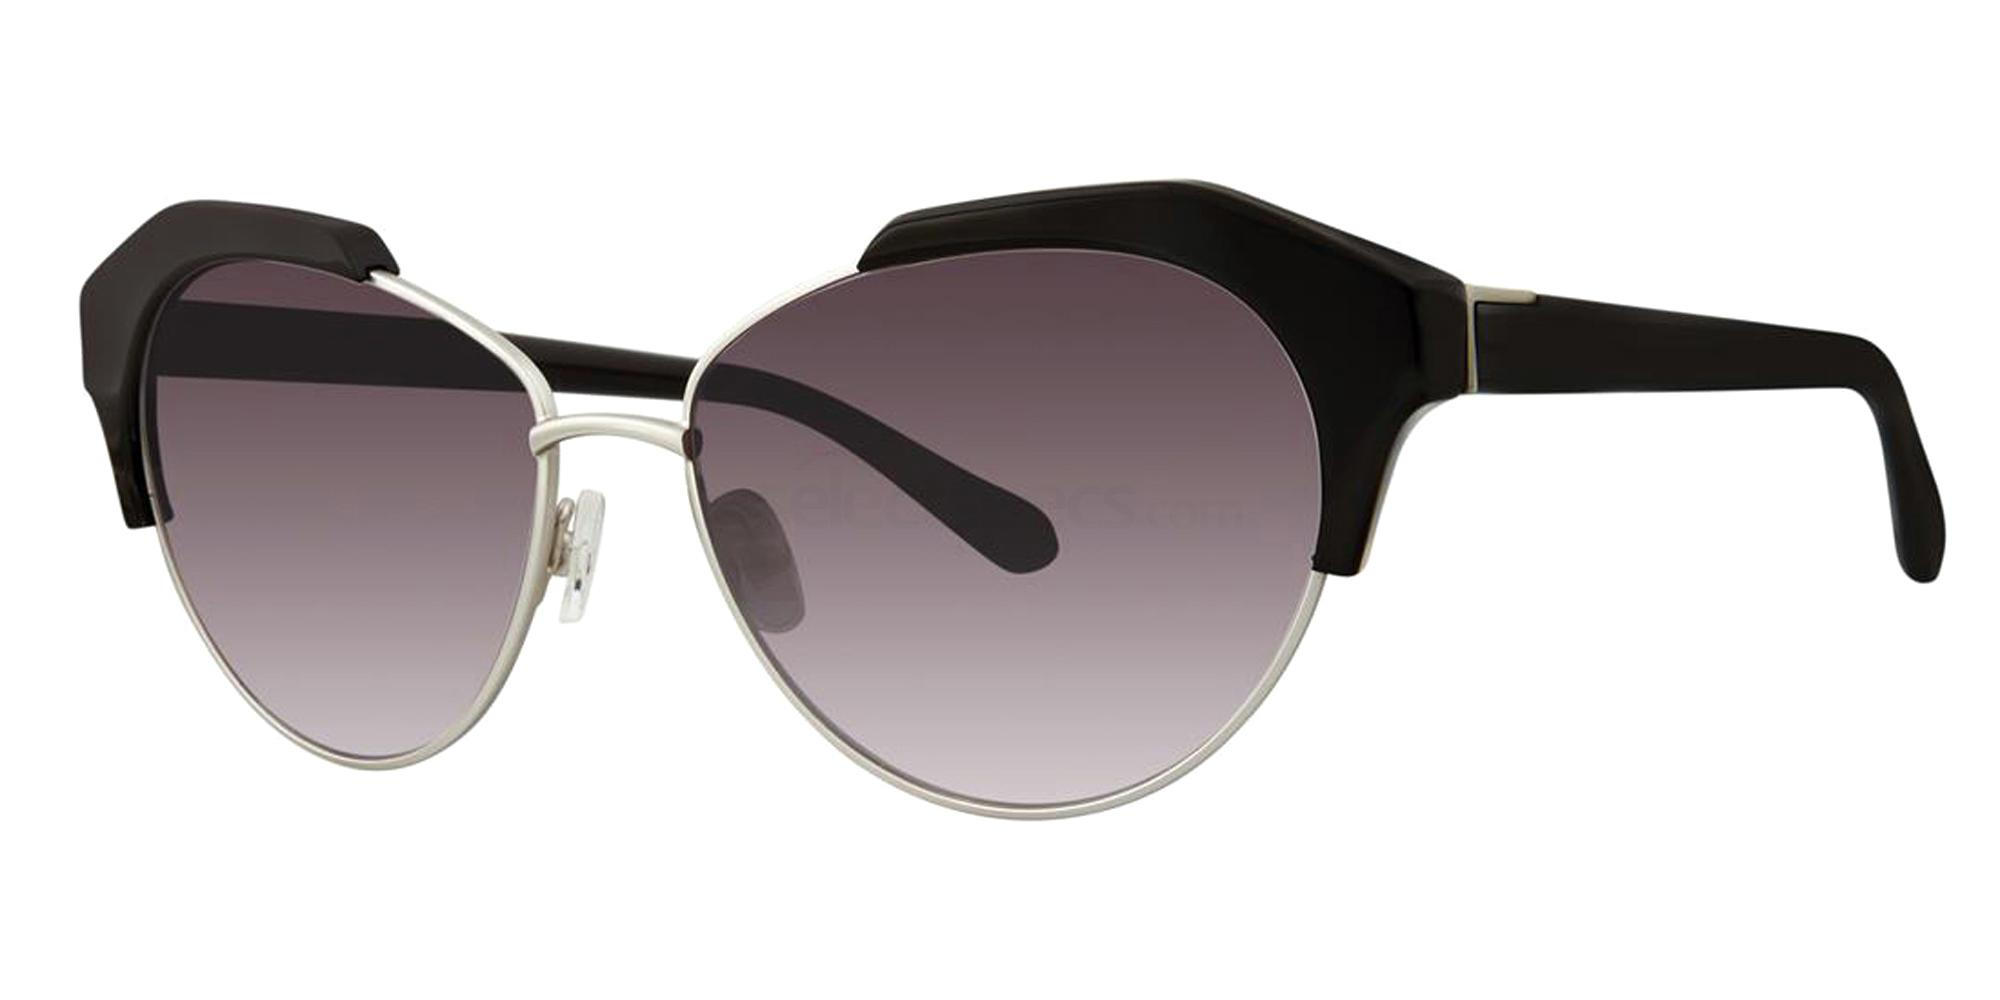 Black KEKE Sunglasses, Zac Posen